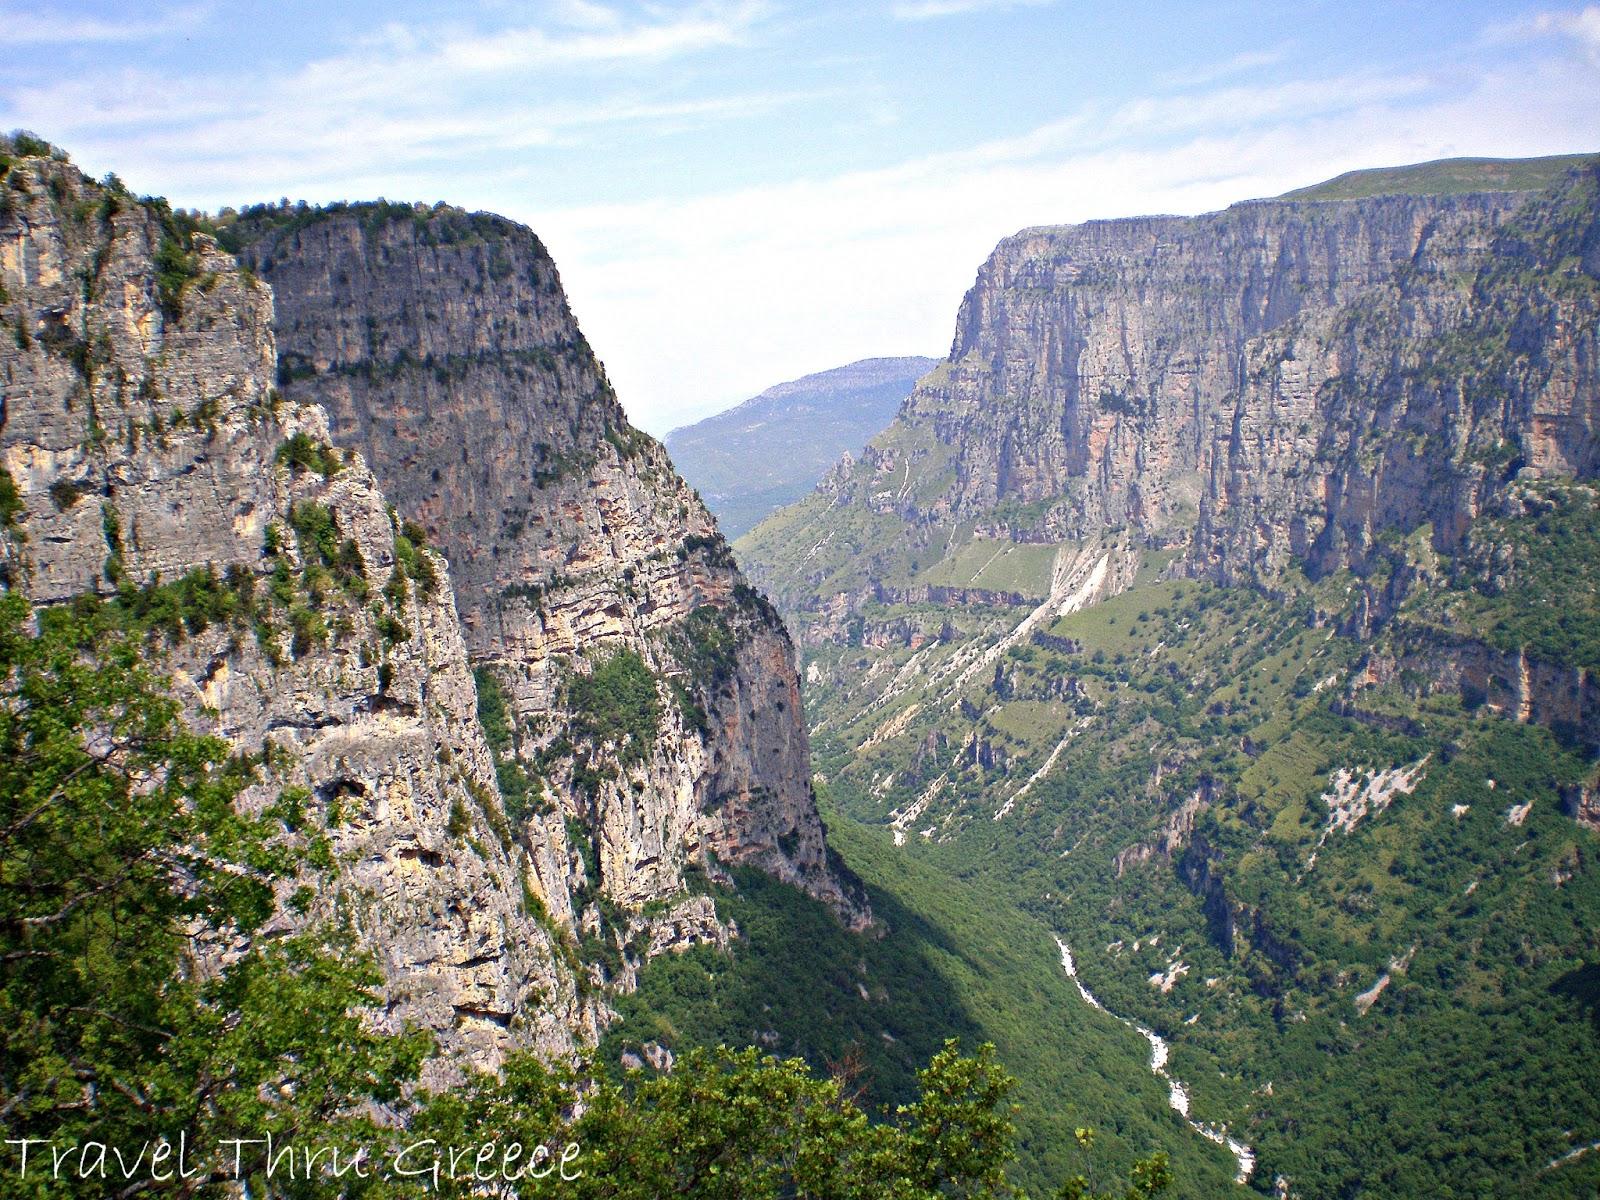 Travel Thru Greece with Mara: Vikos Gorge